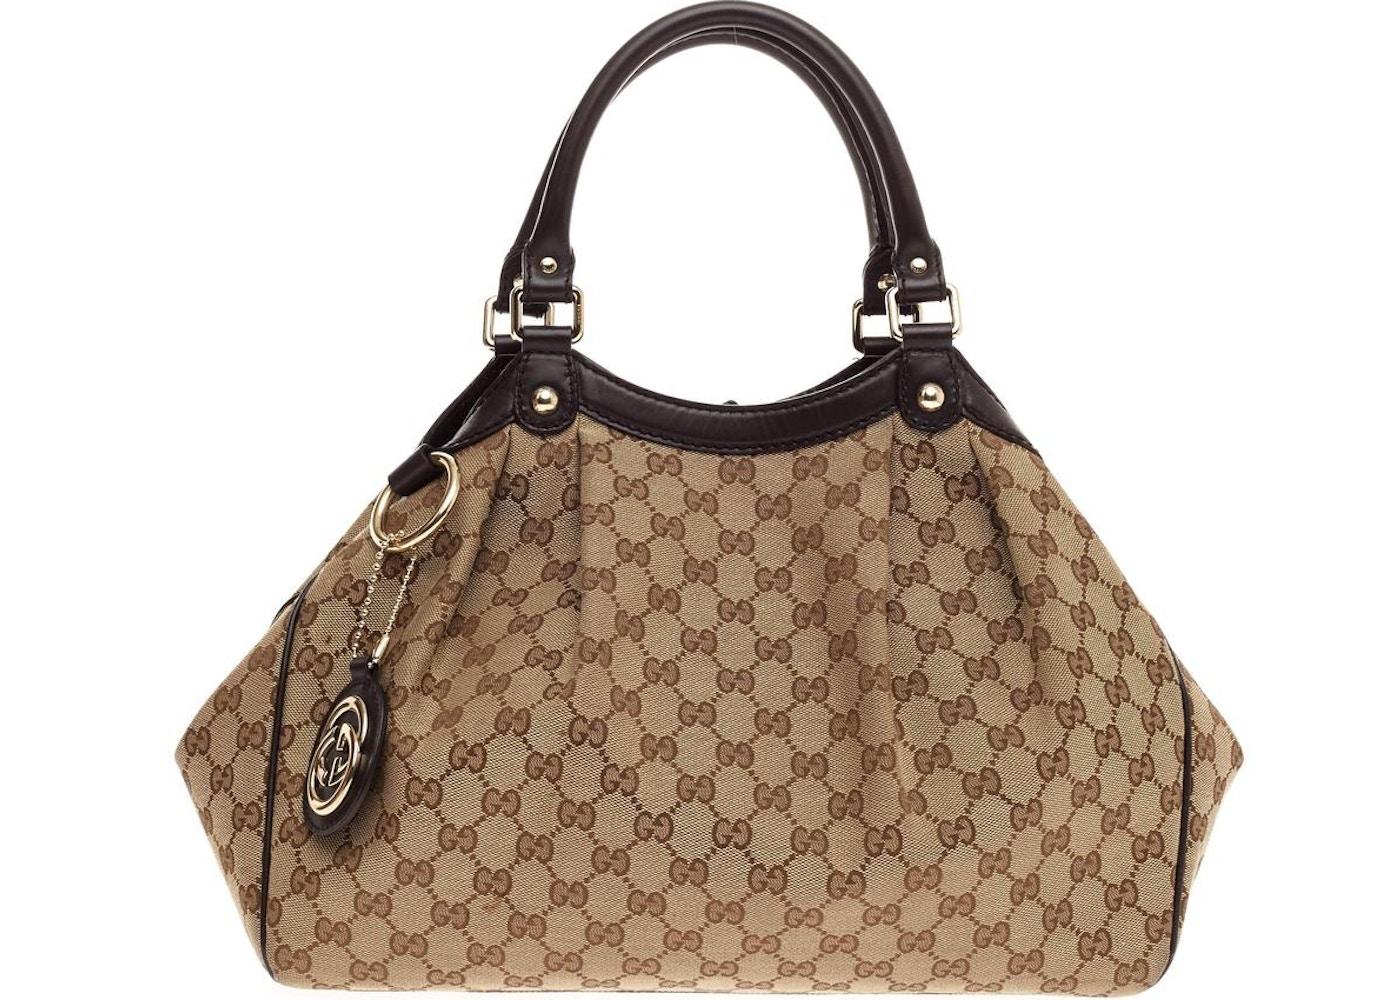 a47a94702ba455 Gucci Sukey Tote GG Monogram GG Leather Charm Medium Brown ...